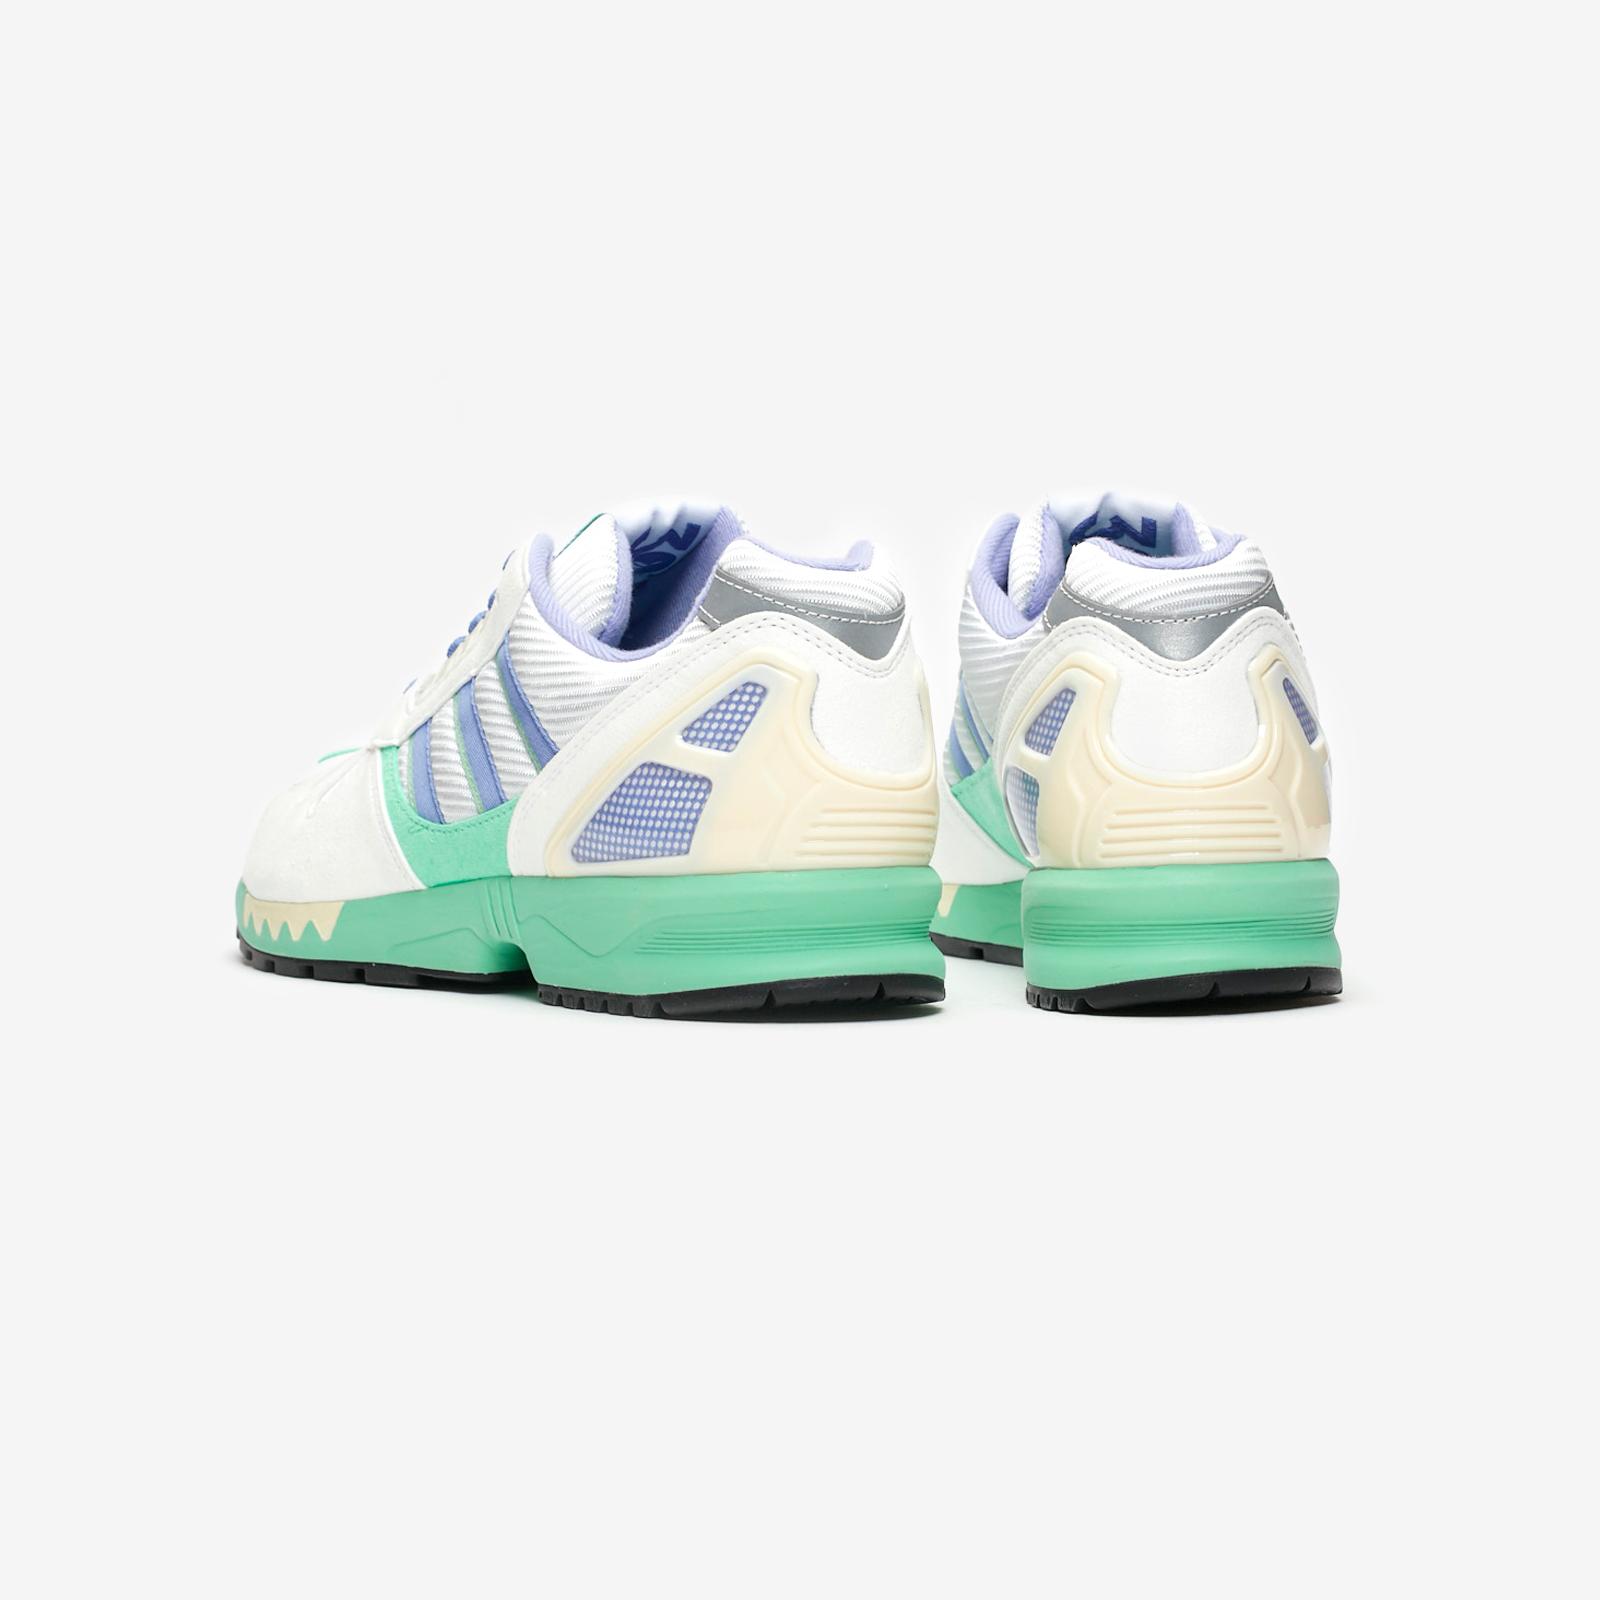 acheter populaire d30e4 89112 adidas ZX 7000 - Fu8404 - Sneakersnstuff | sneakers ...